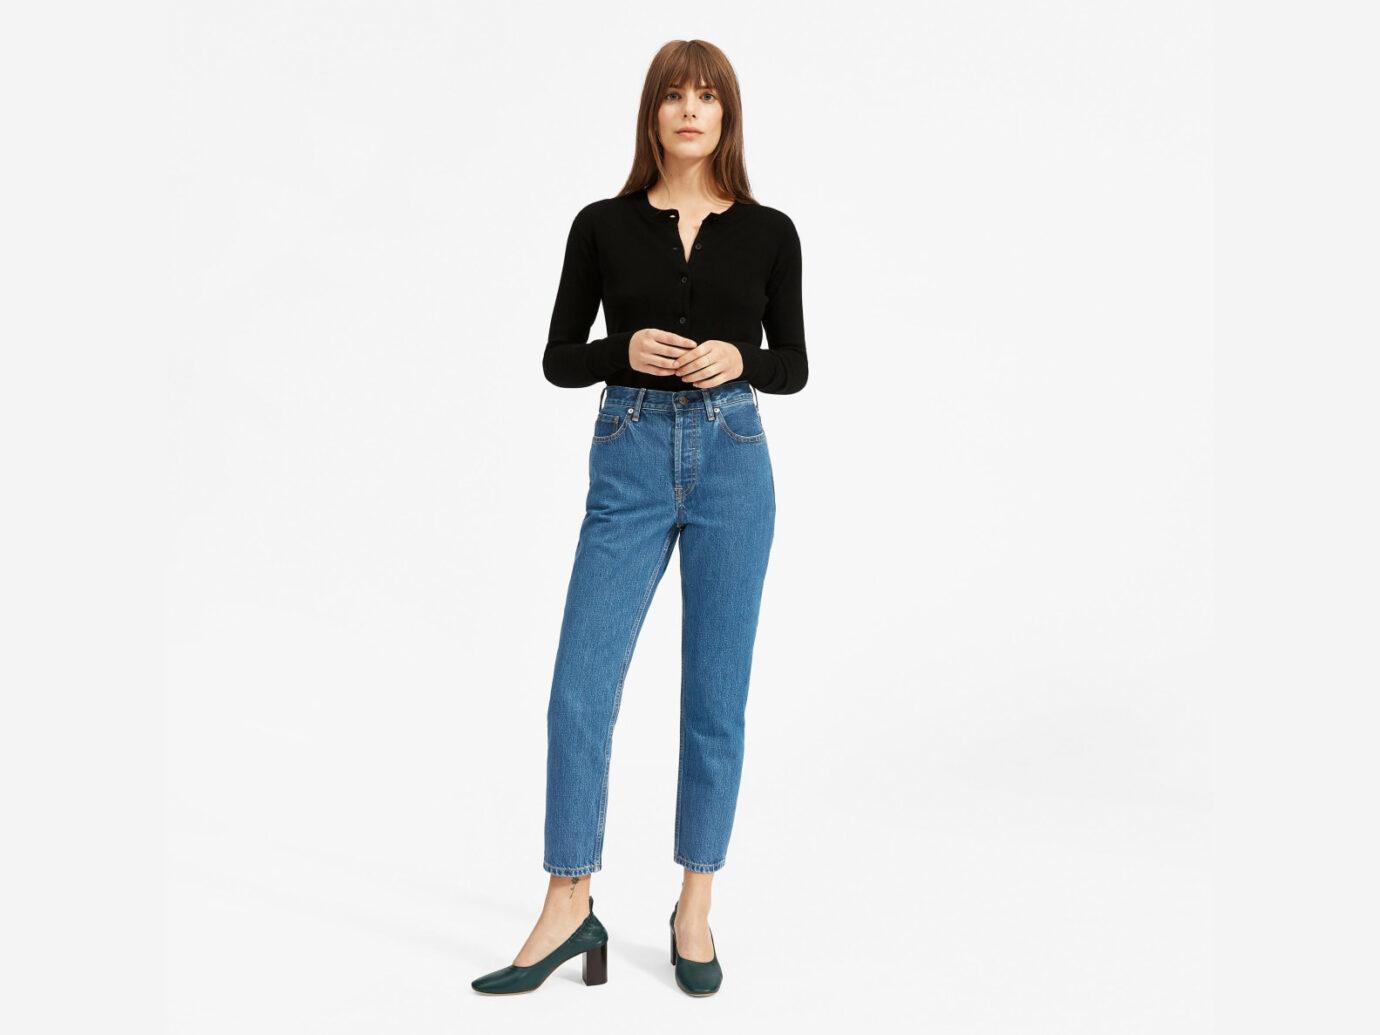 Everlane '90s Cheeky Straight Jean